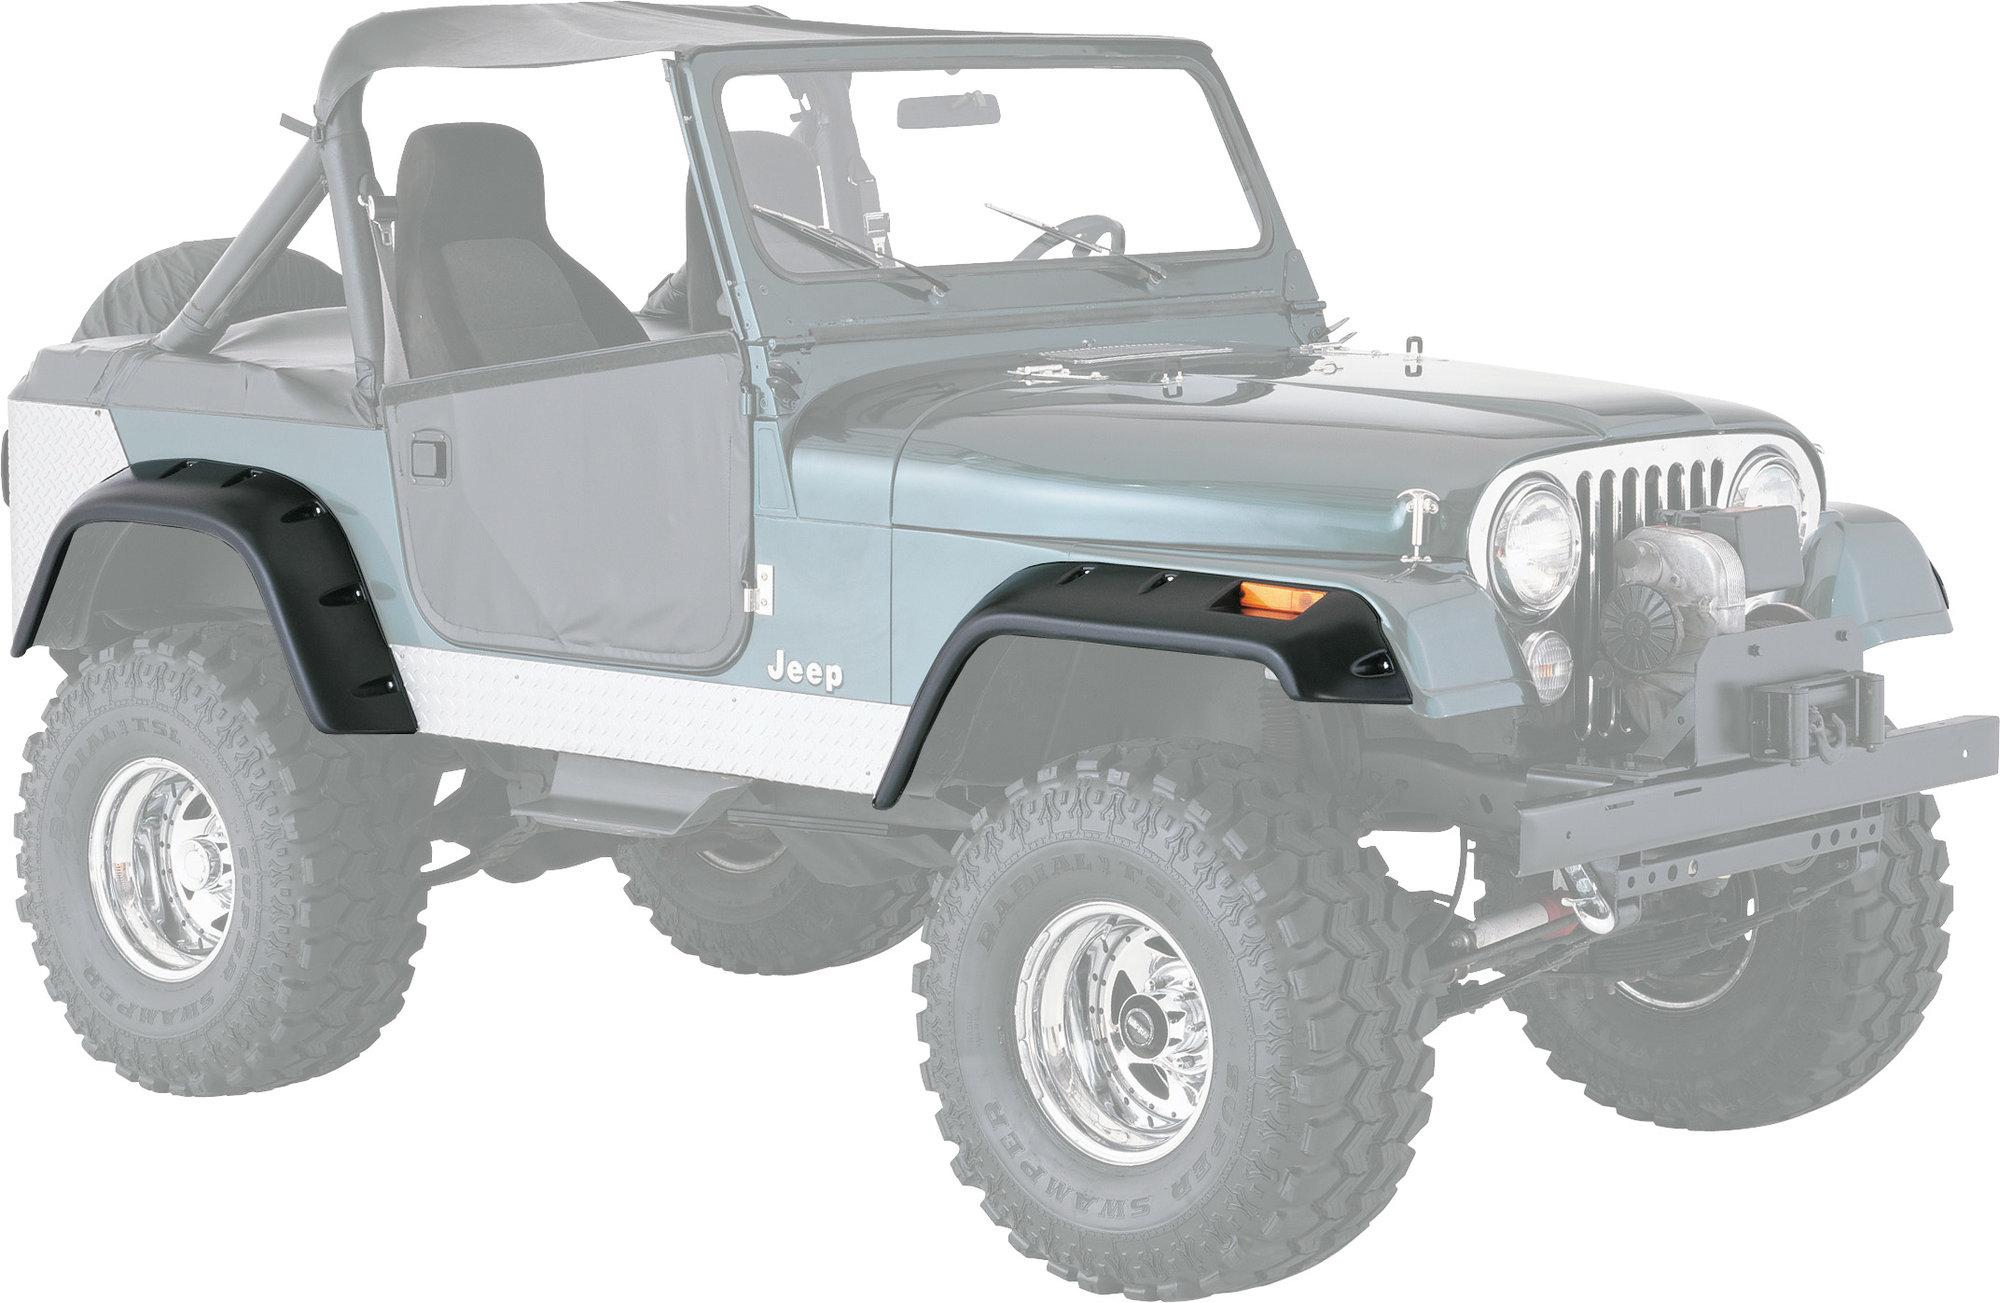 hight resolution of quadratec 6 pocket style fender flares for 76 86 jeep cj 5 cj 7 quadratec